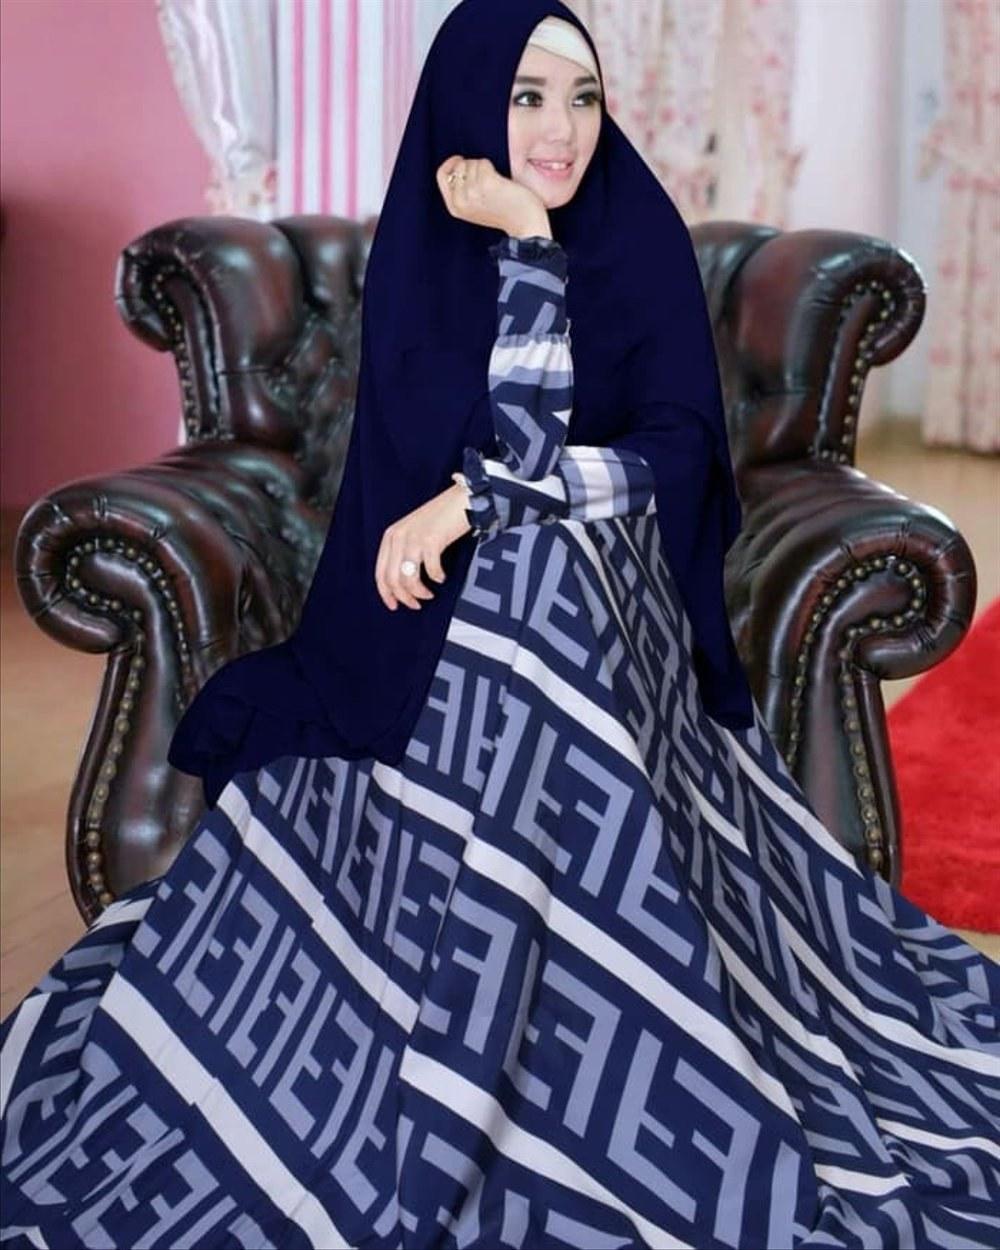 Inspirasi Baju Pengantin Muslim Syari Qwdq Tangga Dapur Peralatan